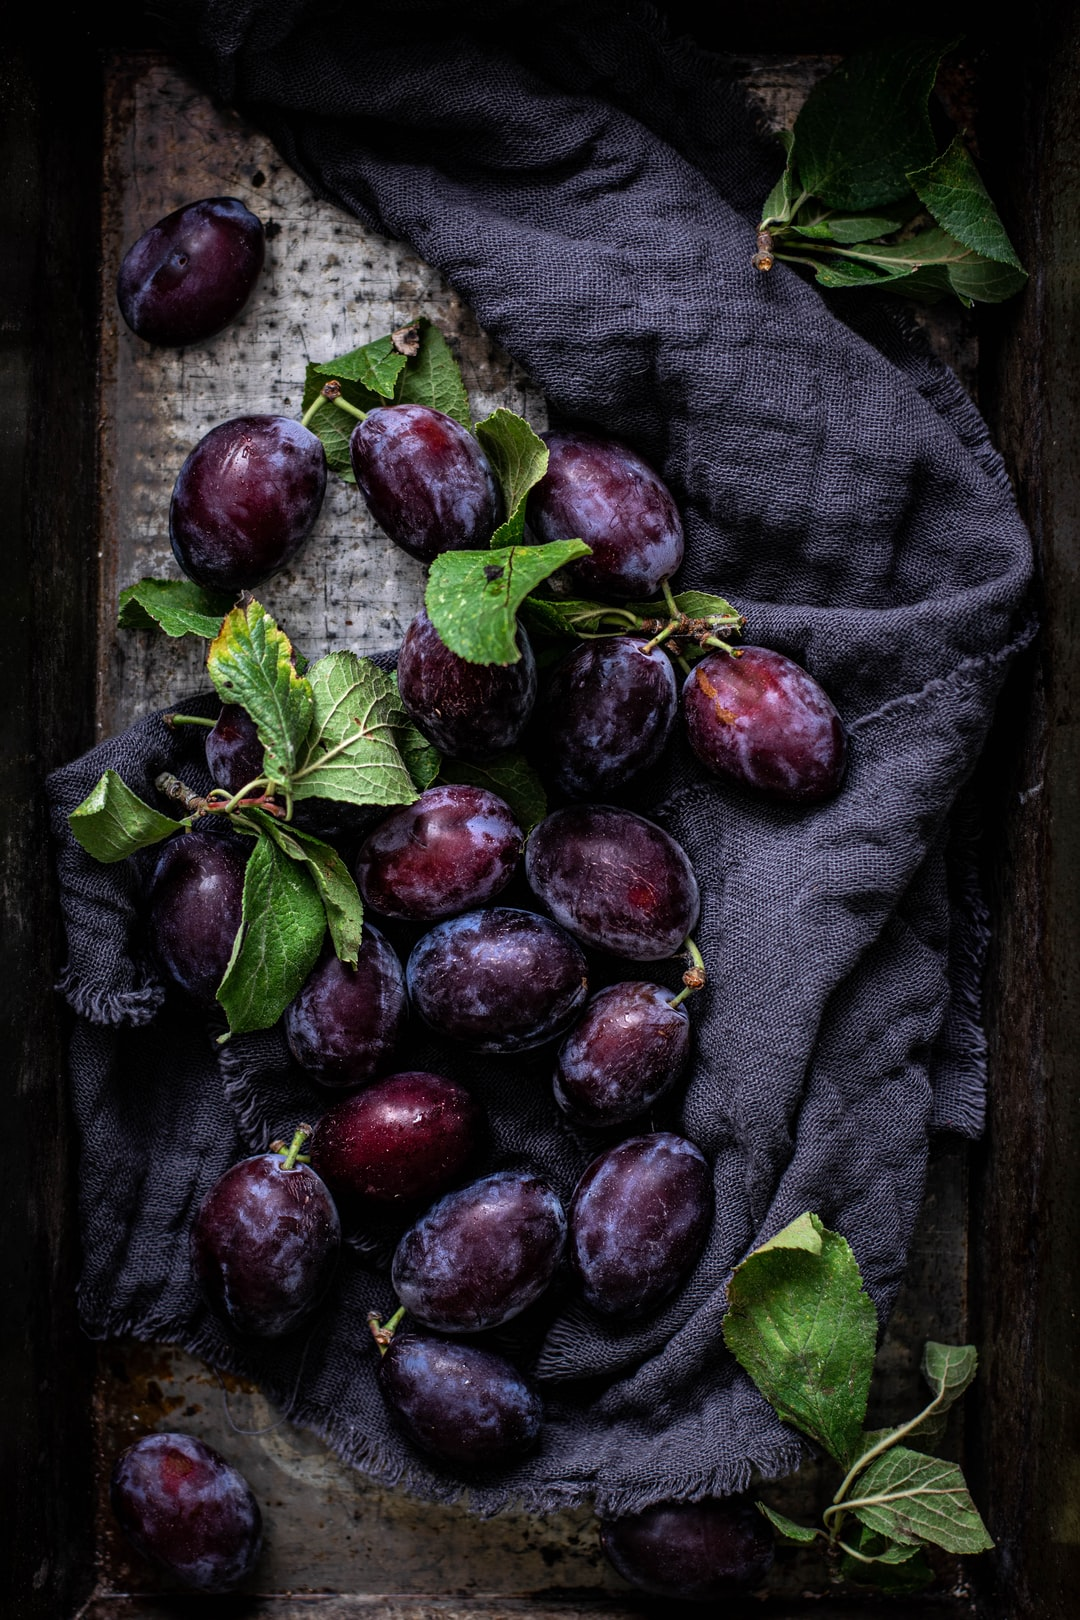 plums season